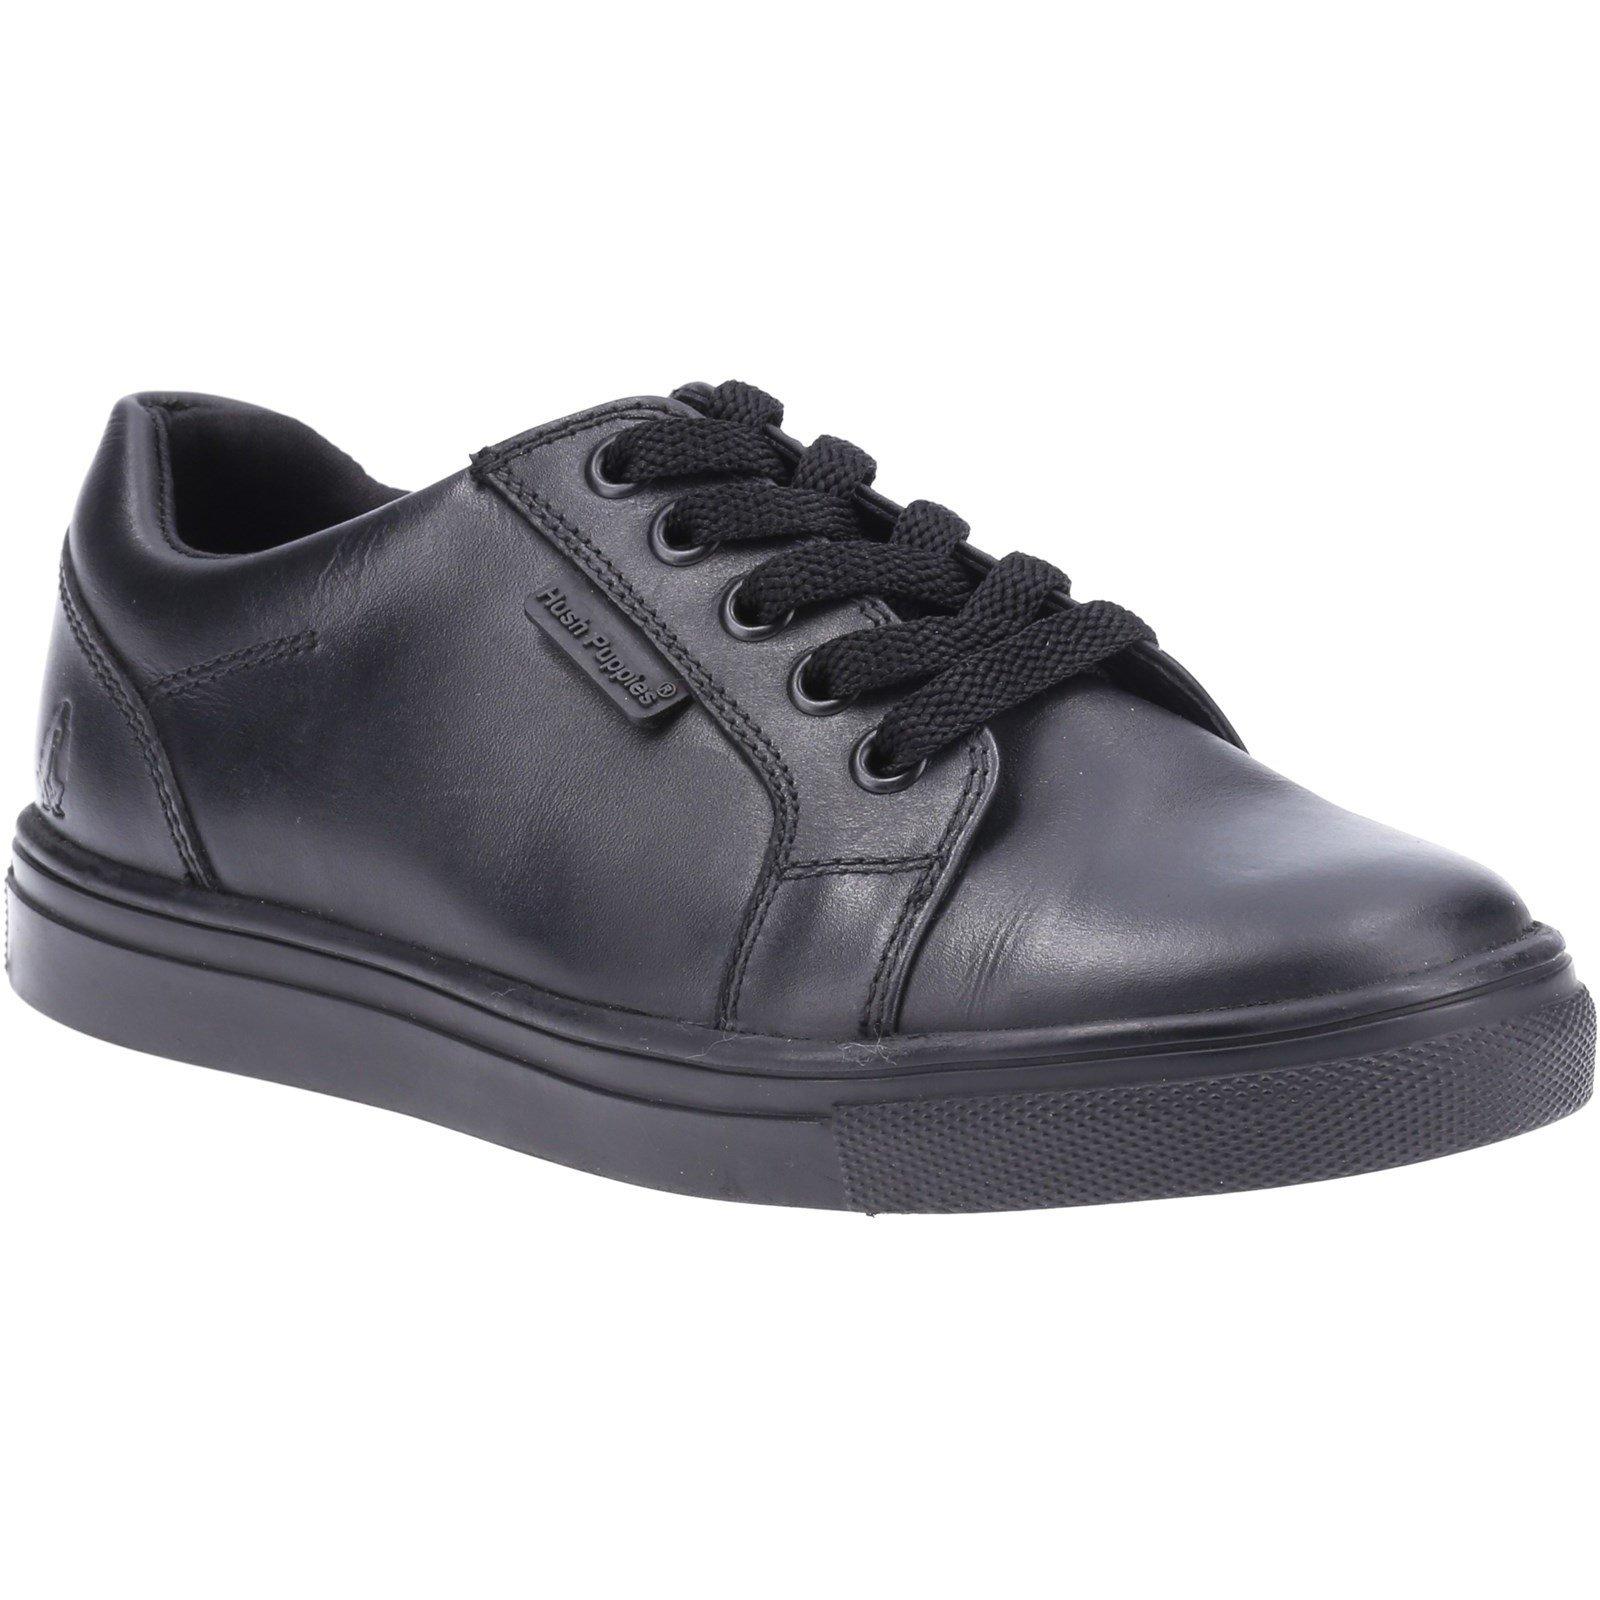 Hush Puppies Kid's Sam Junior School Shoe Black 32579 - Black 1